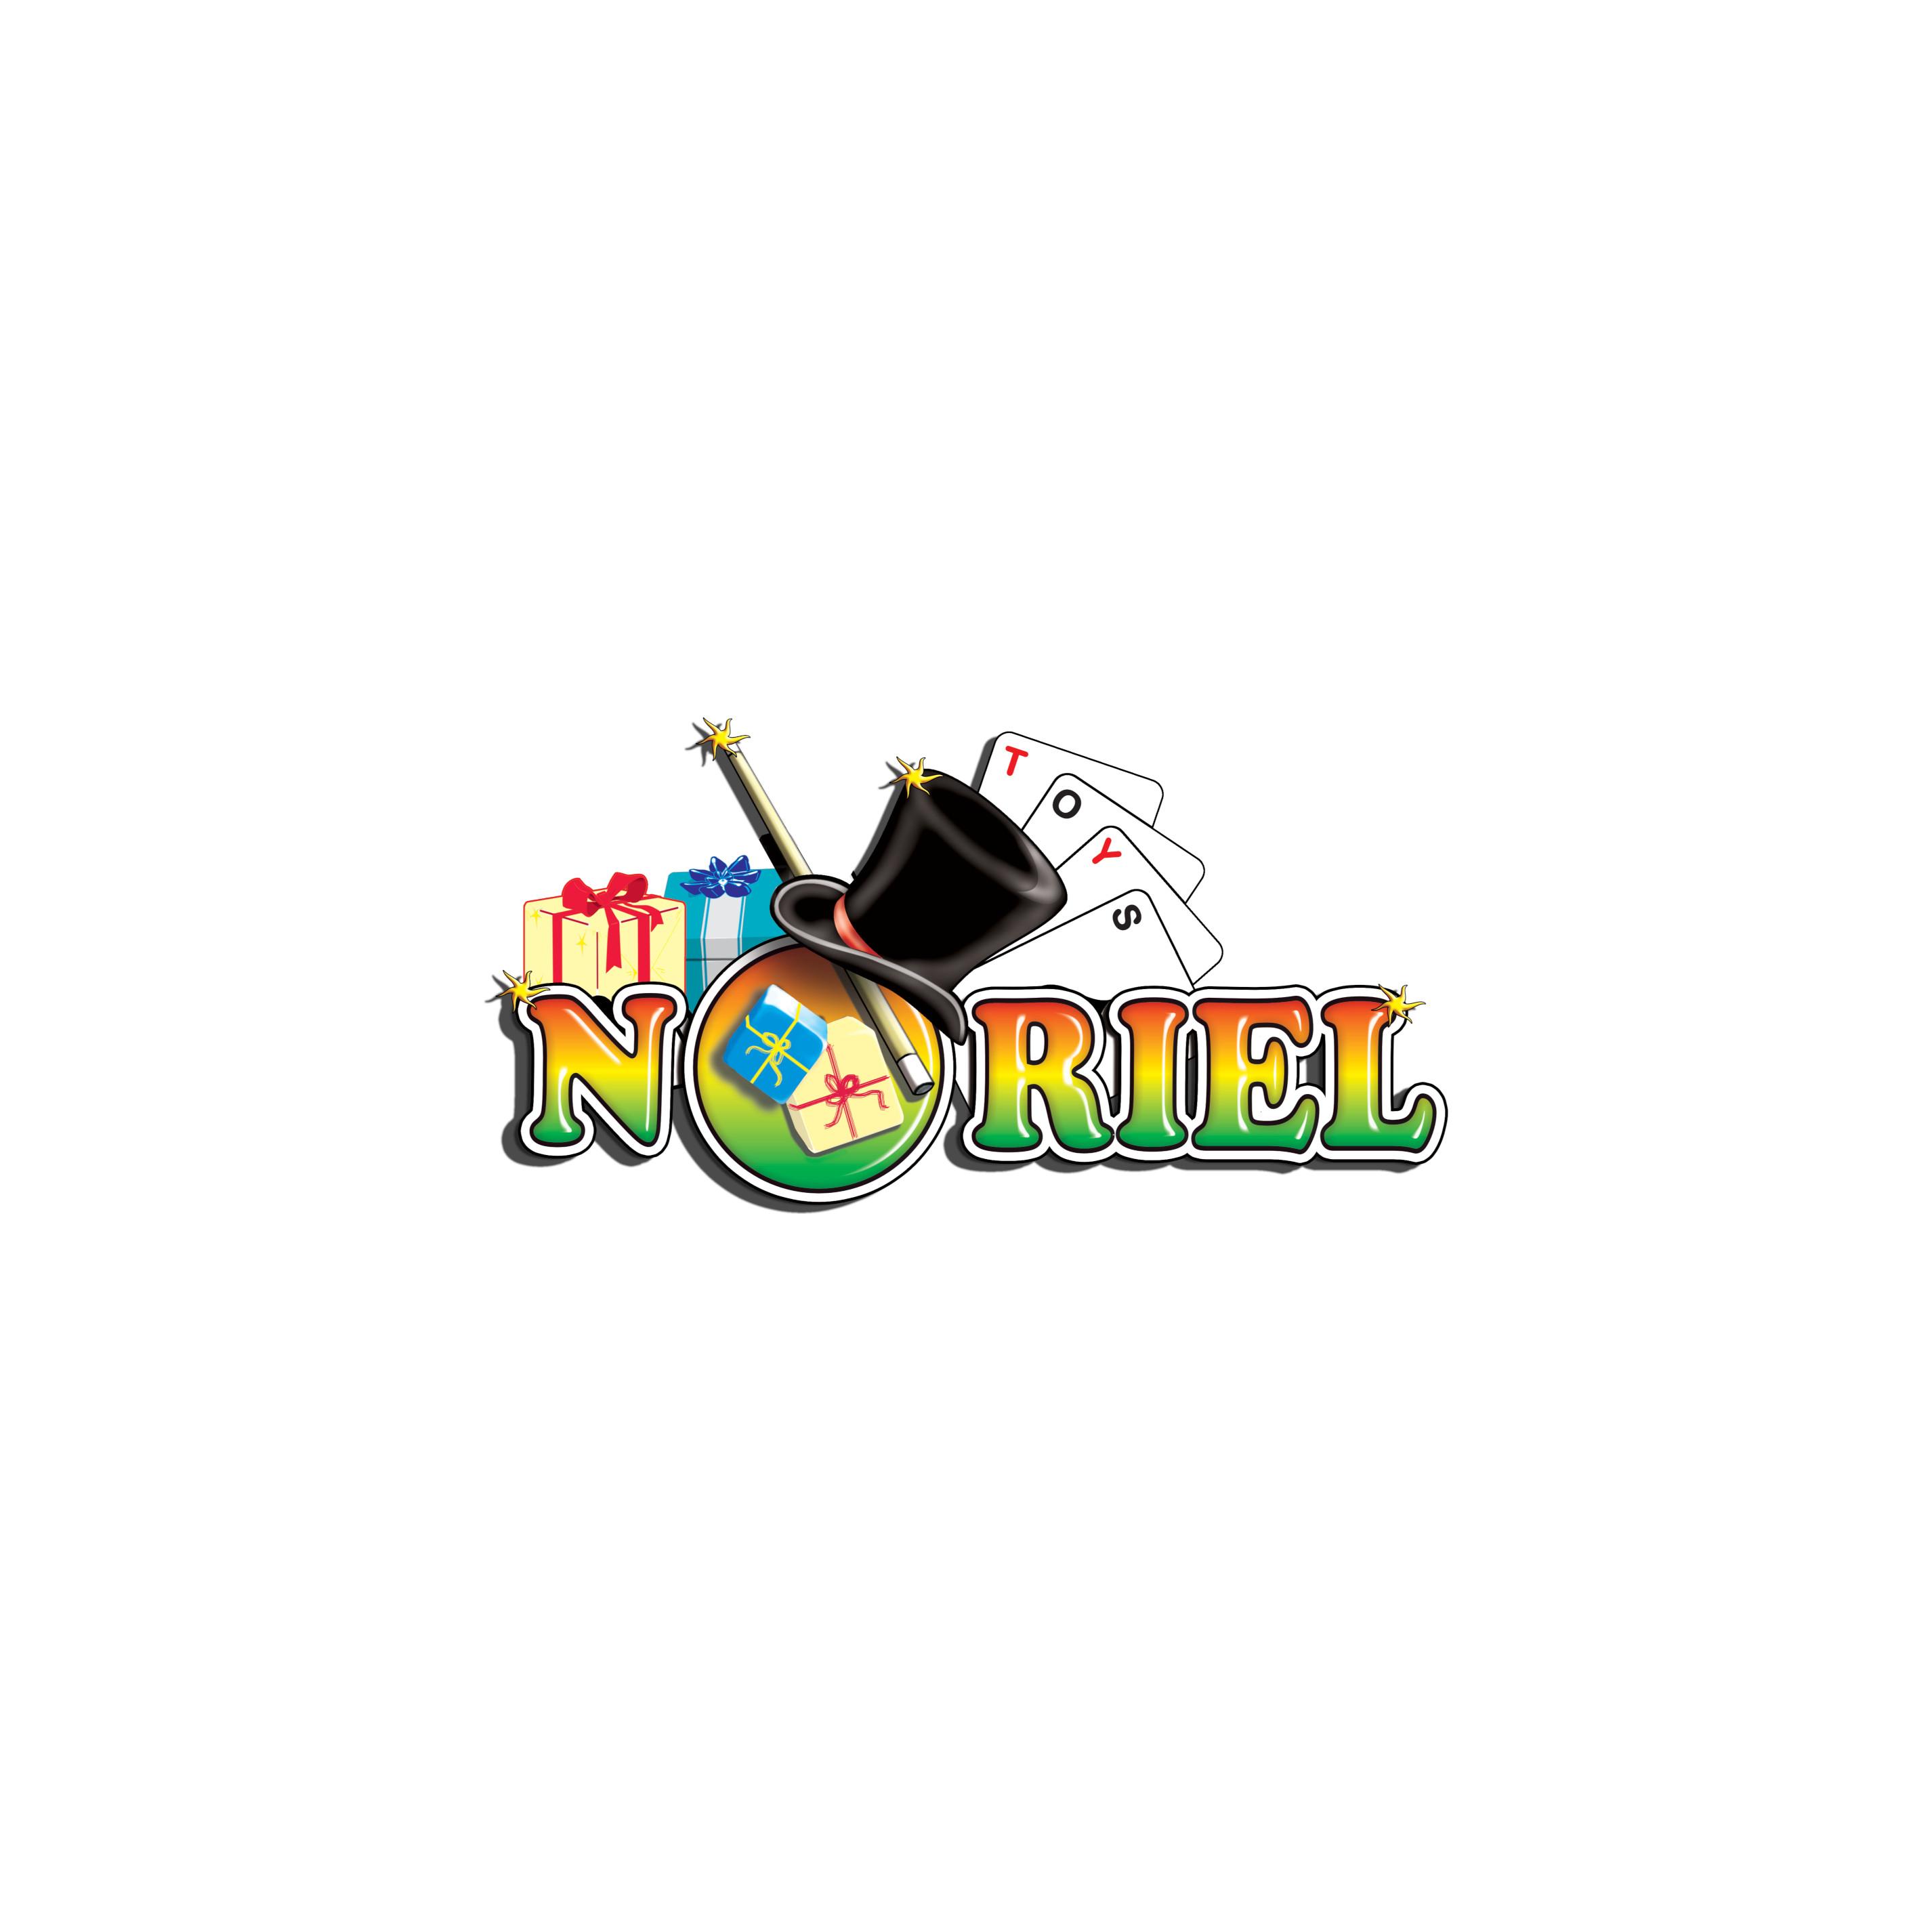 Set desen cu accesorii 5 in 1 Spongebob